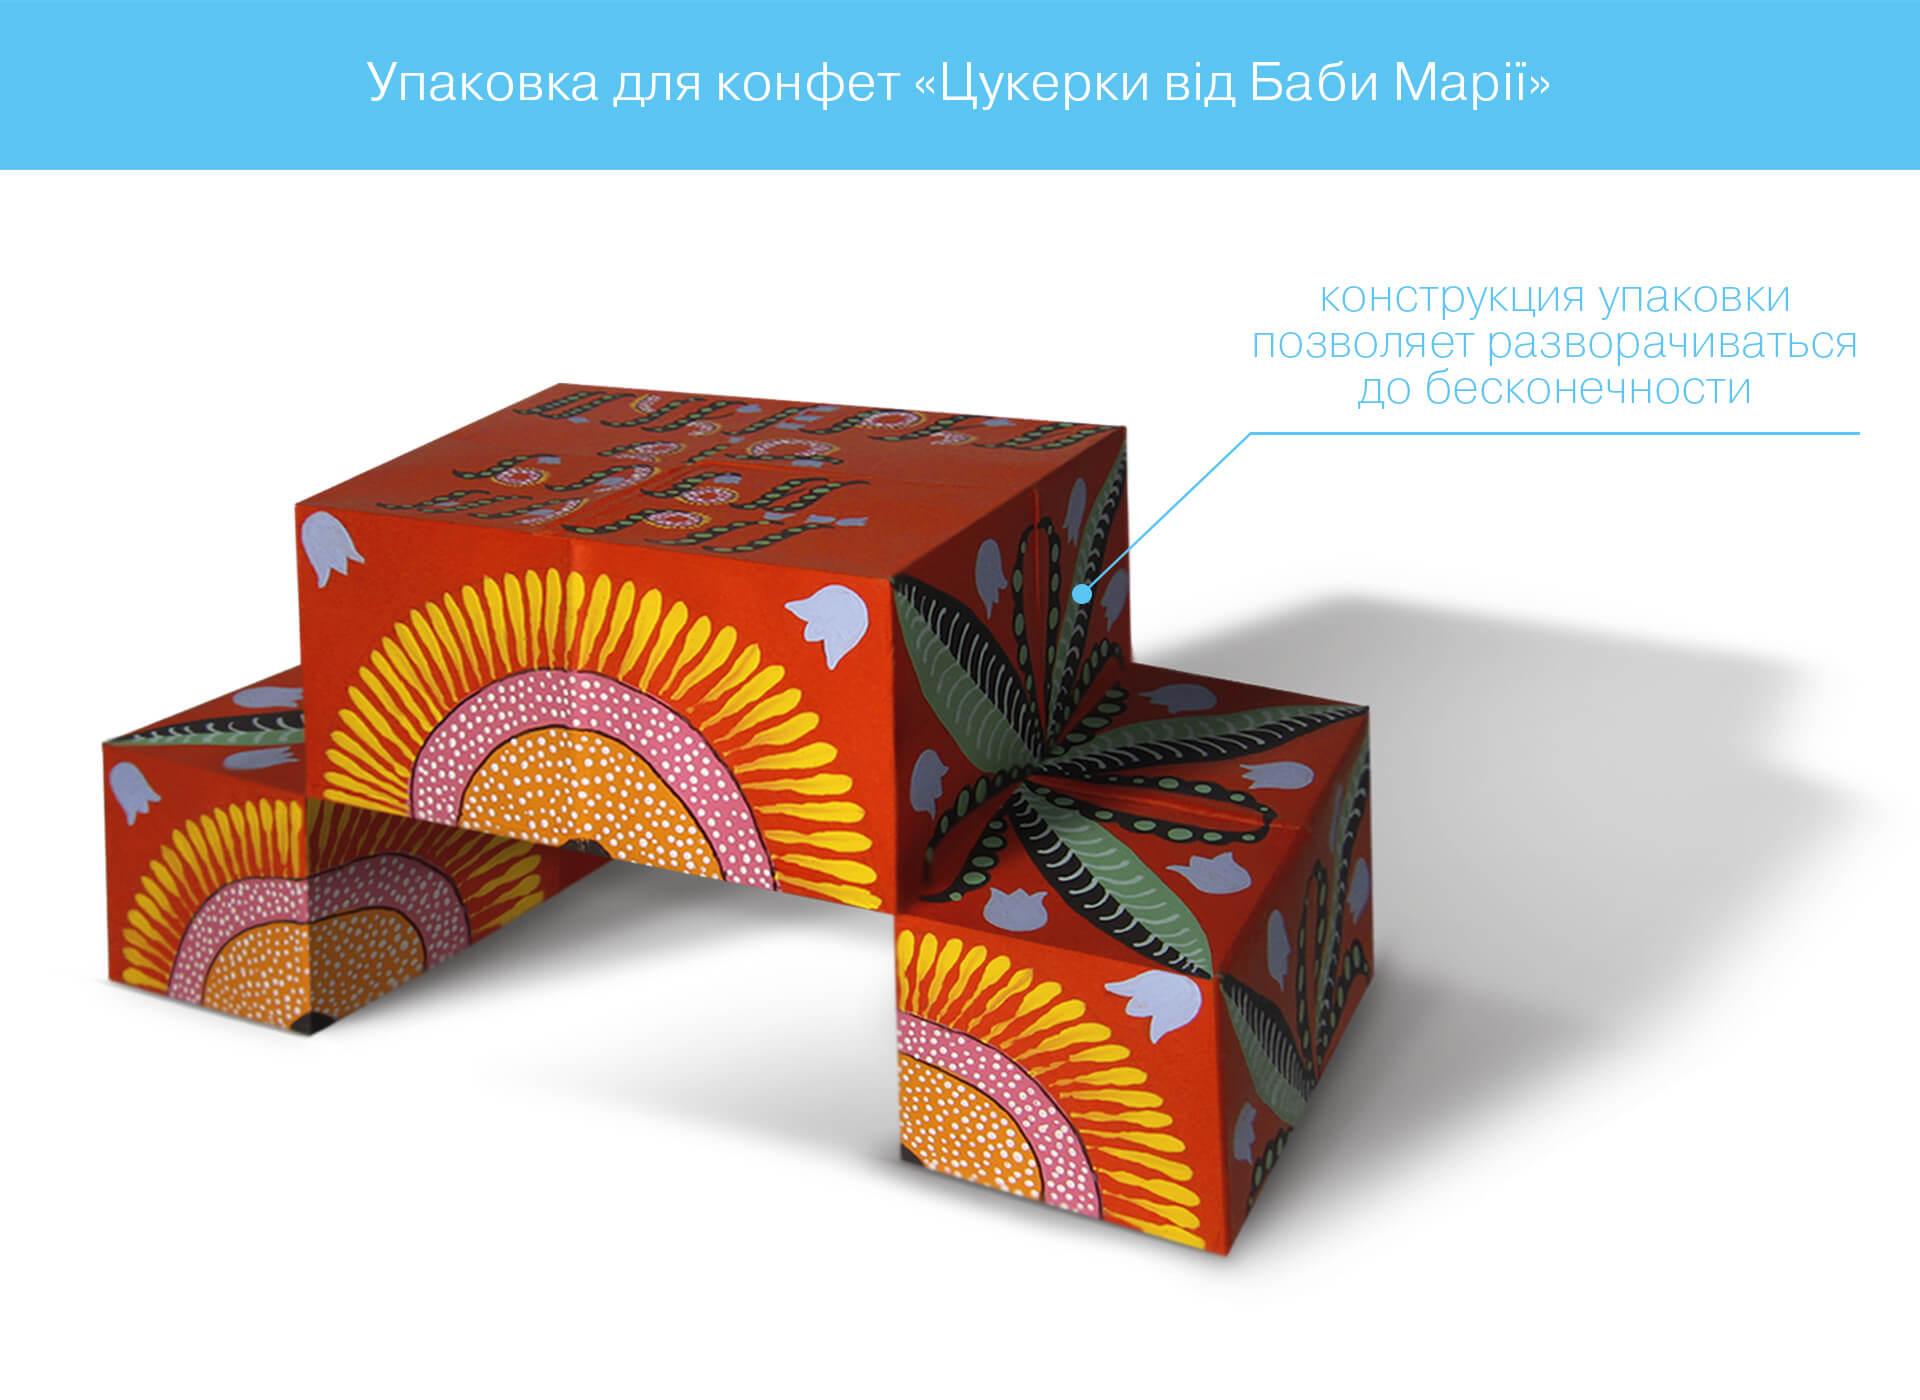 prokochuk_irina_packing-tsukerki-od-babi-mari%d1%97_2